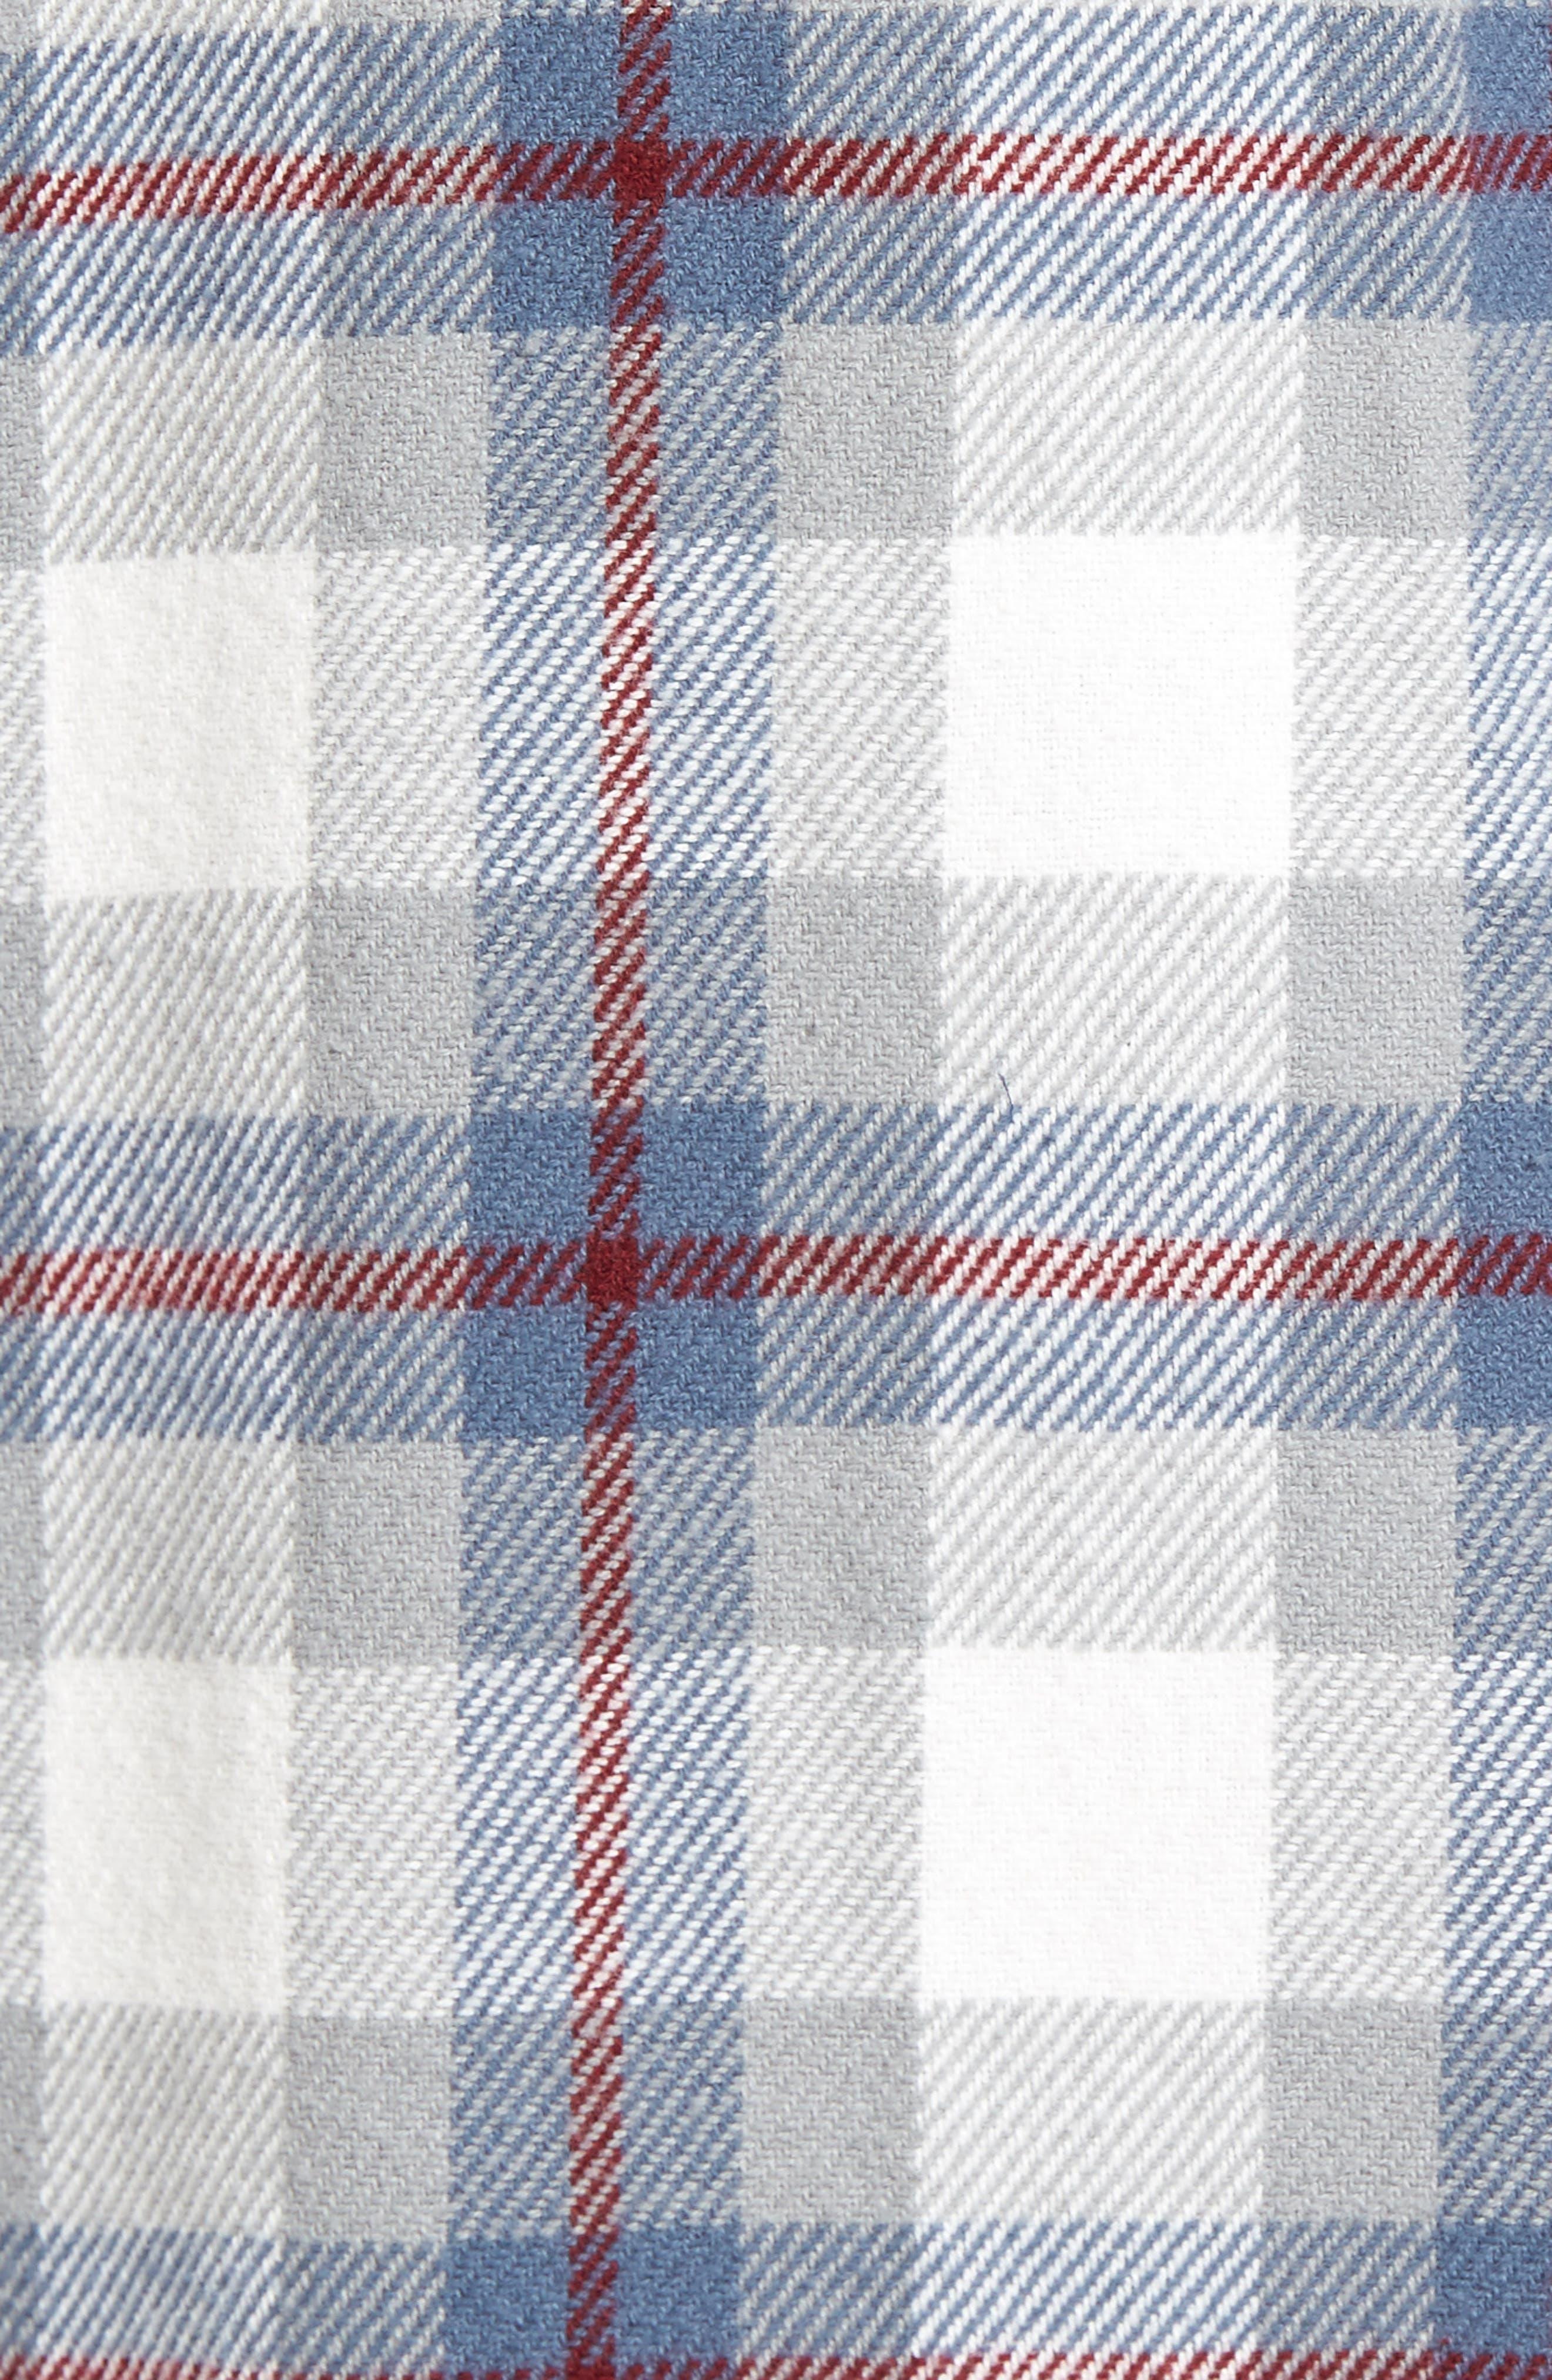 'That'll Work' Trim Fit Plaid Flannel Shirt,                             Alternate thumbnail 25, color,